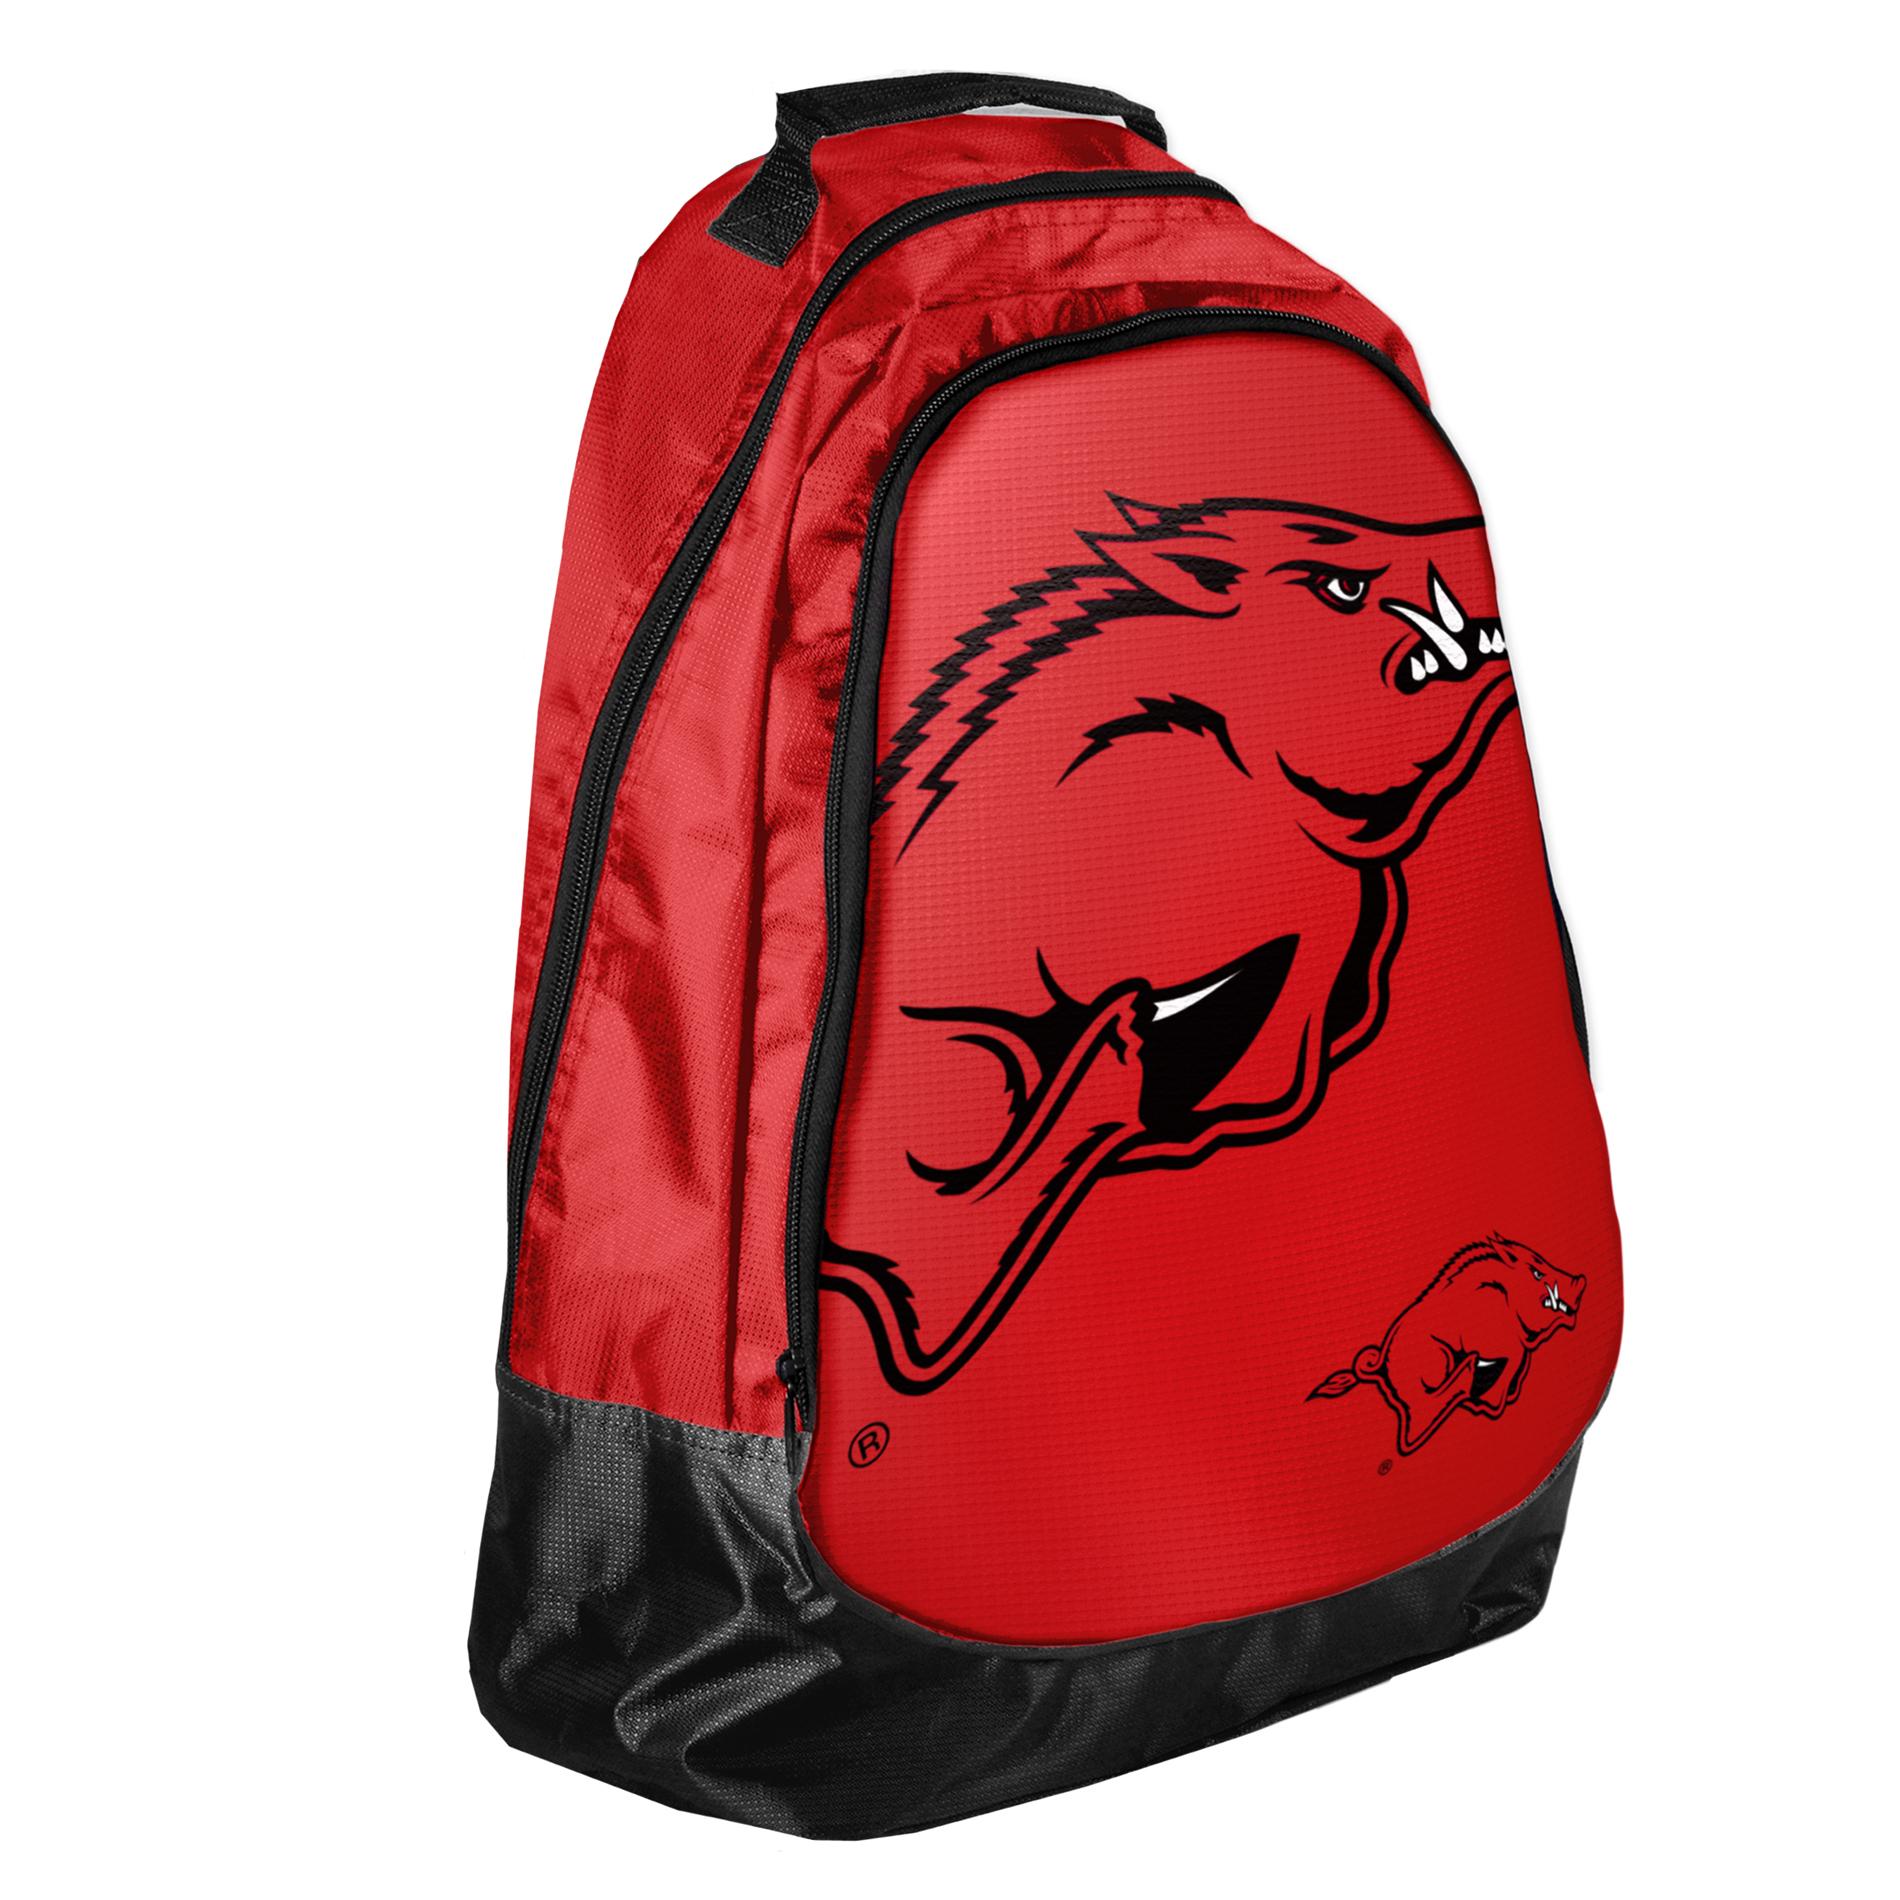 Forever Collectibles NCAA Structured Backpack University of Arkansas Razorbacks (#BPNC13ARK) PartNumber: 00659816000P KsnValue: 00659816000 MfgPartNumber: 175733